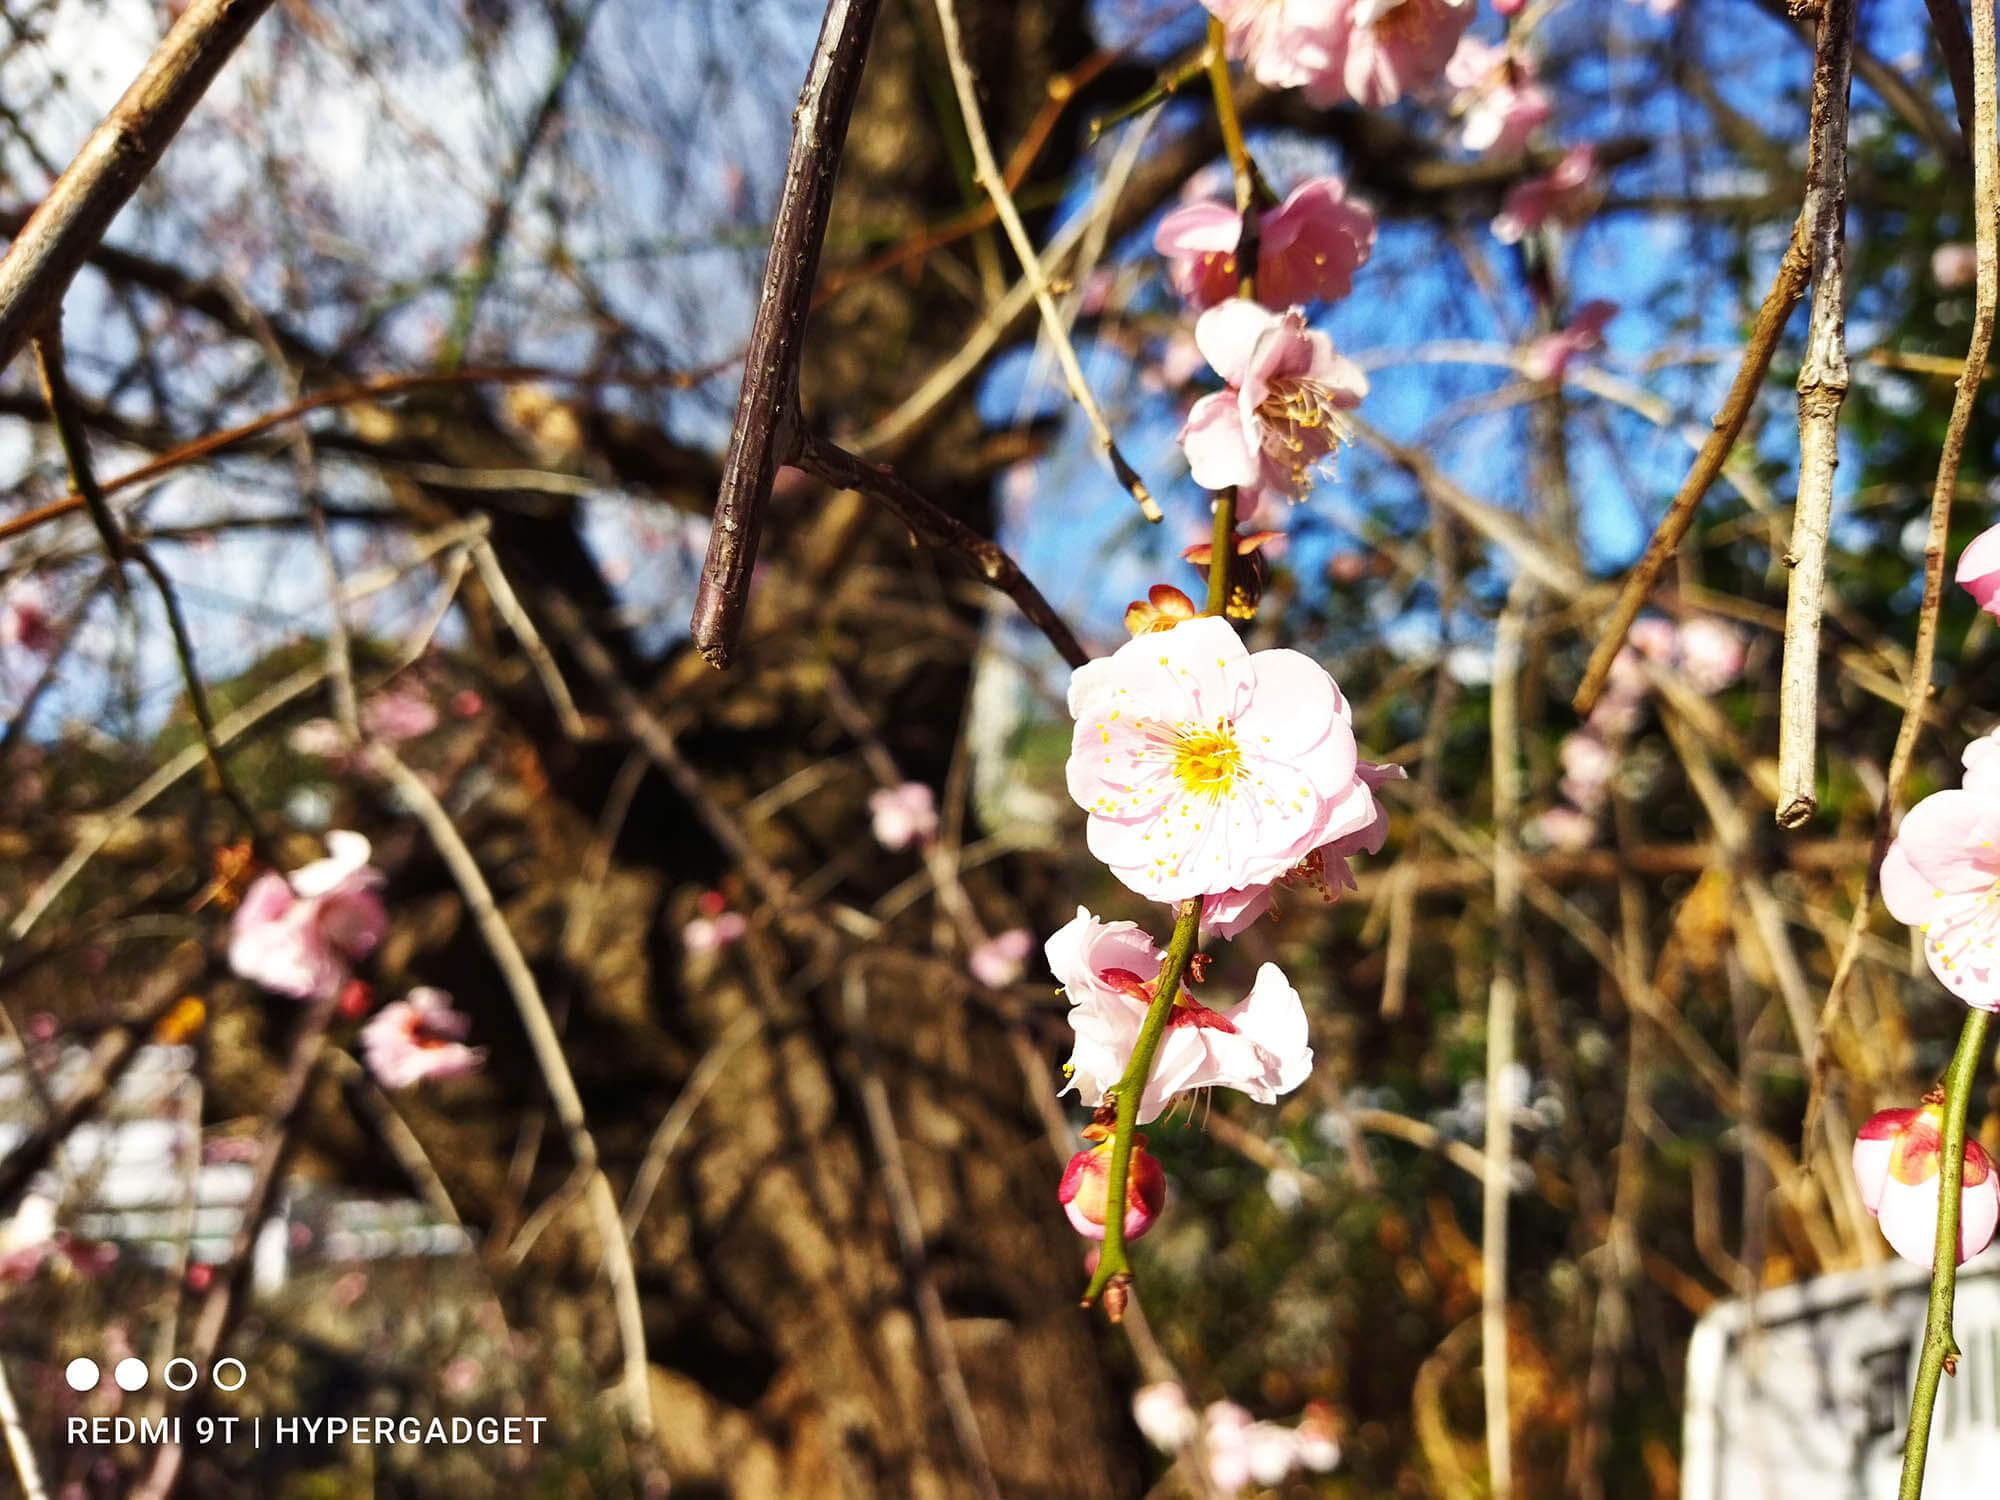 Xiaomiのデフォルトカメラアプリは花びらが白飛び